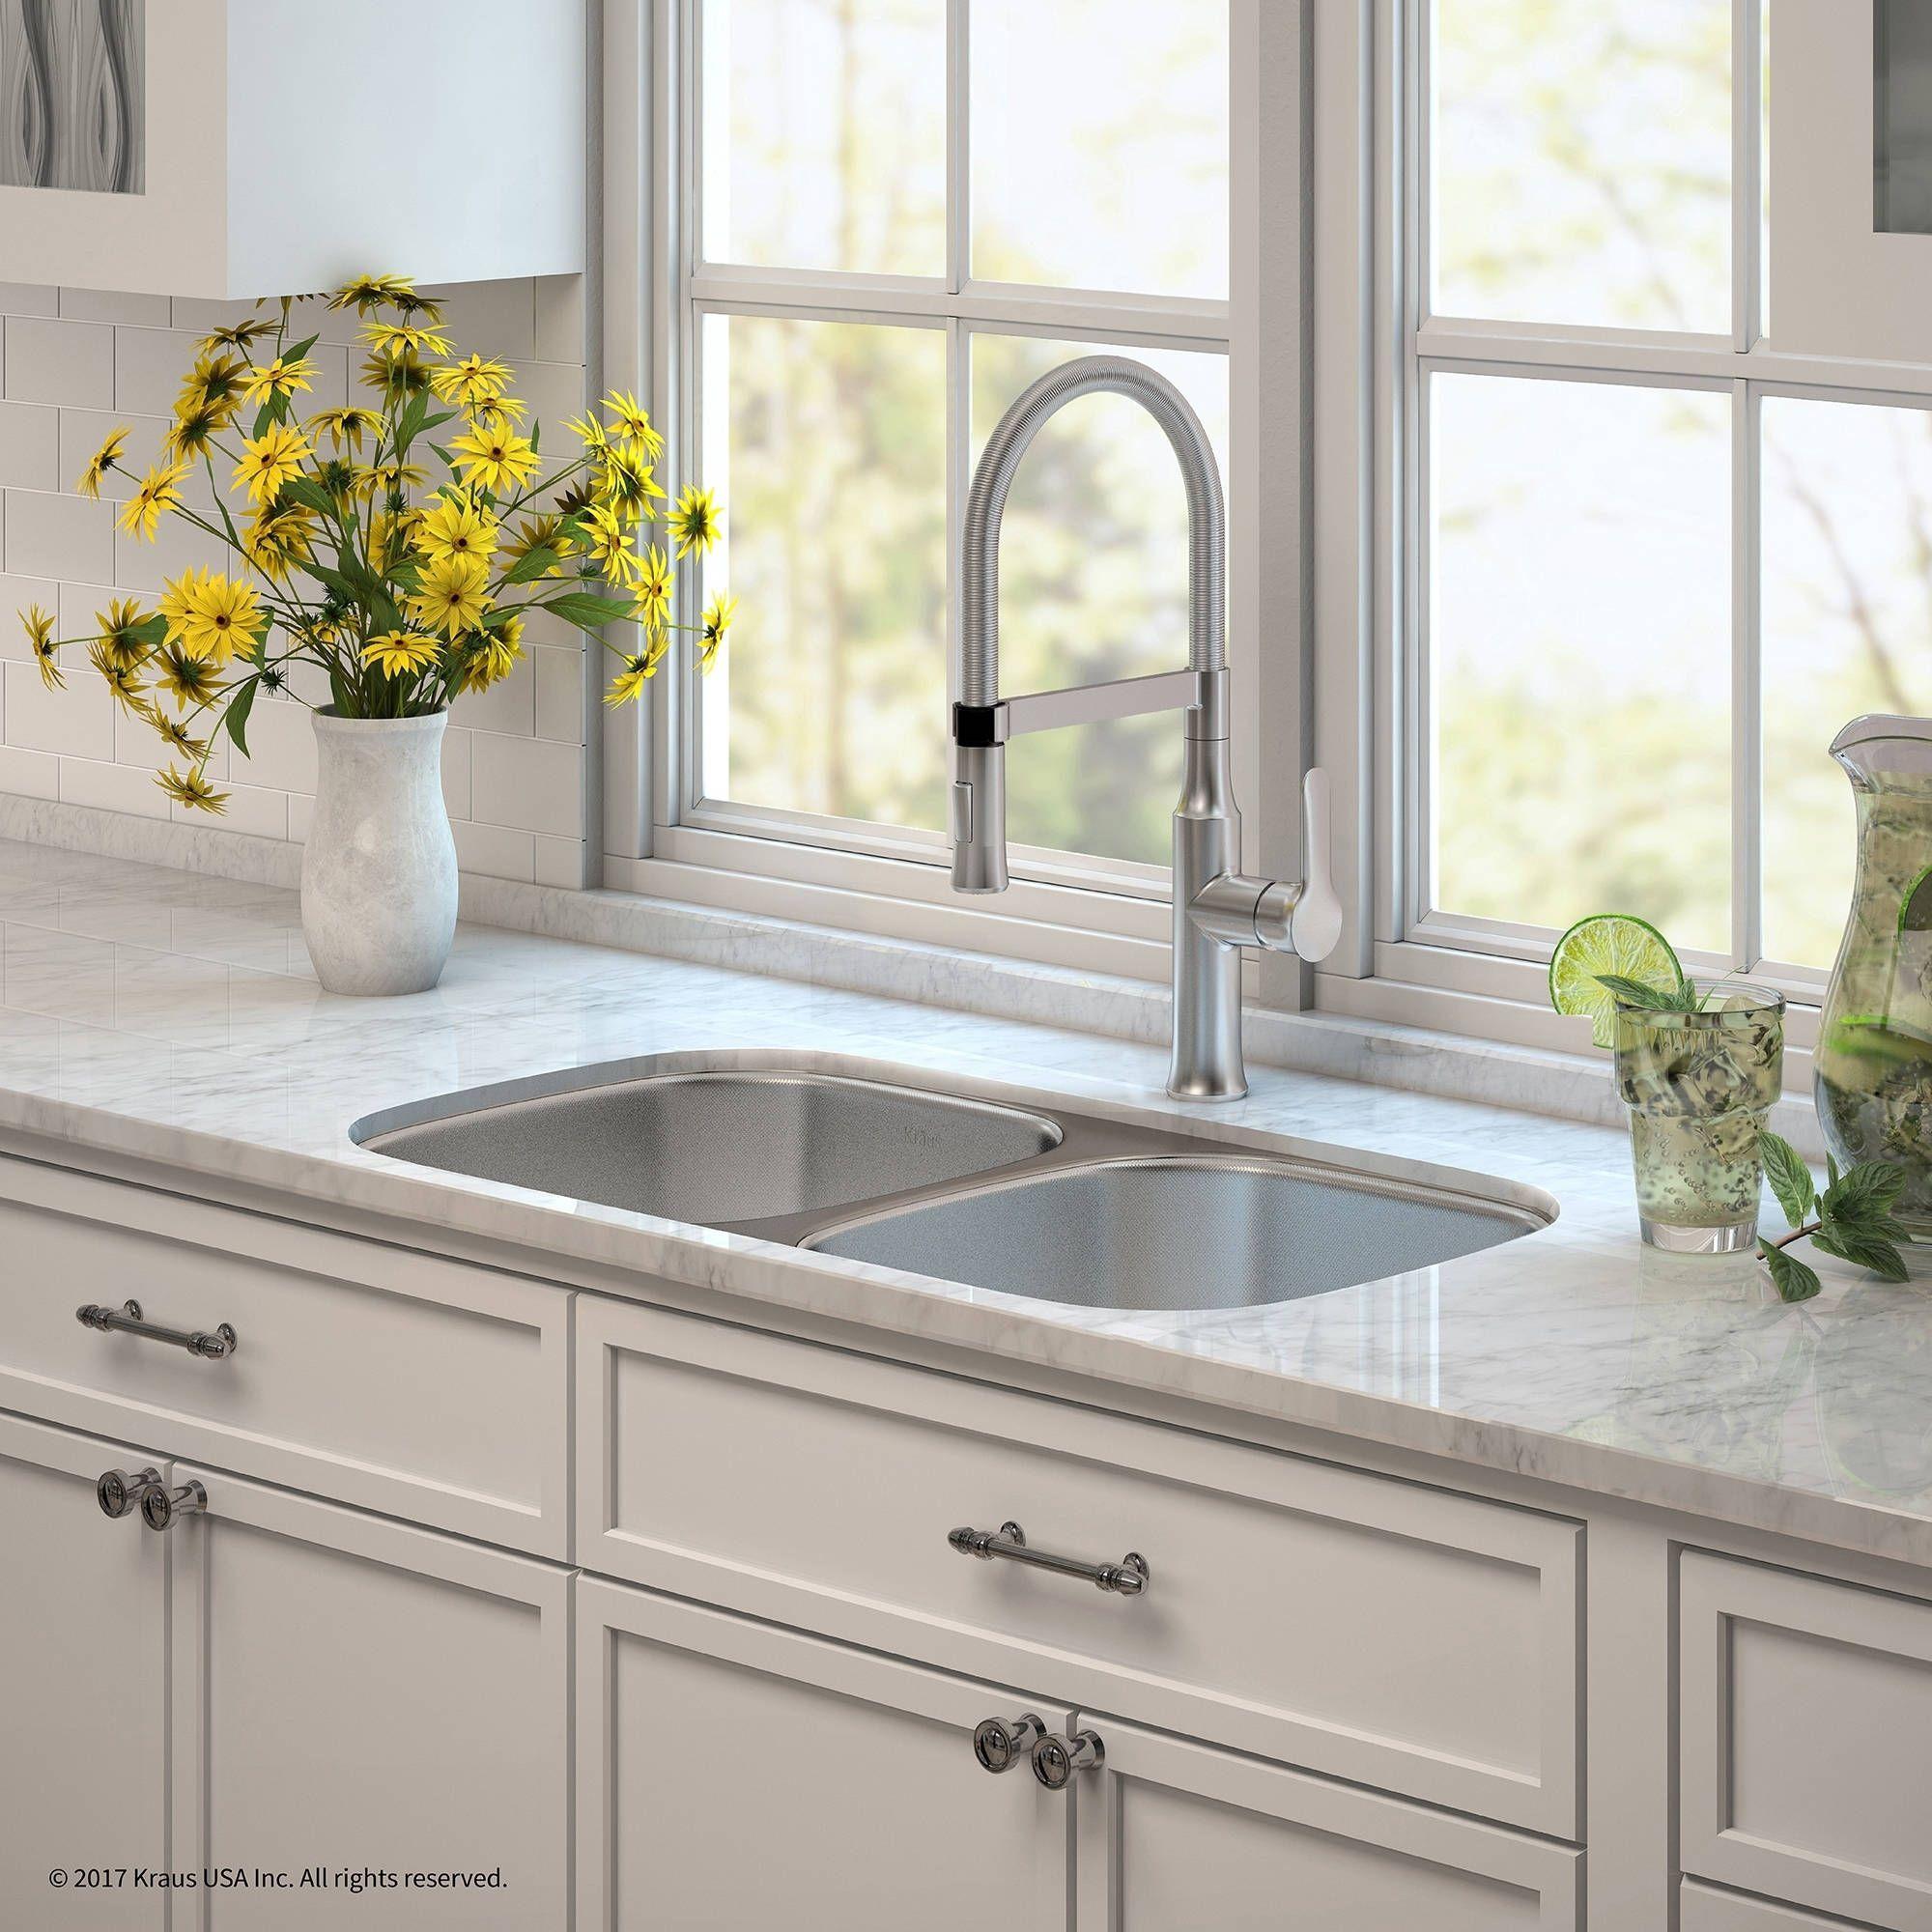 Kraus 32 Kitchen Sink & Nola Commercial Faucet With Soap Dispenser Gorgeous Undermount Kitchen Sink Inspiration Design